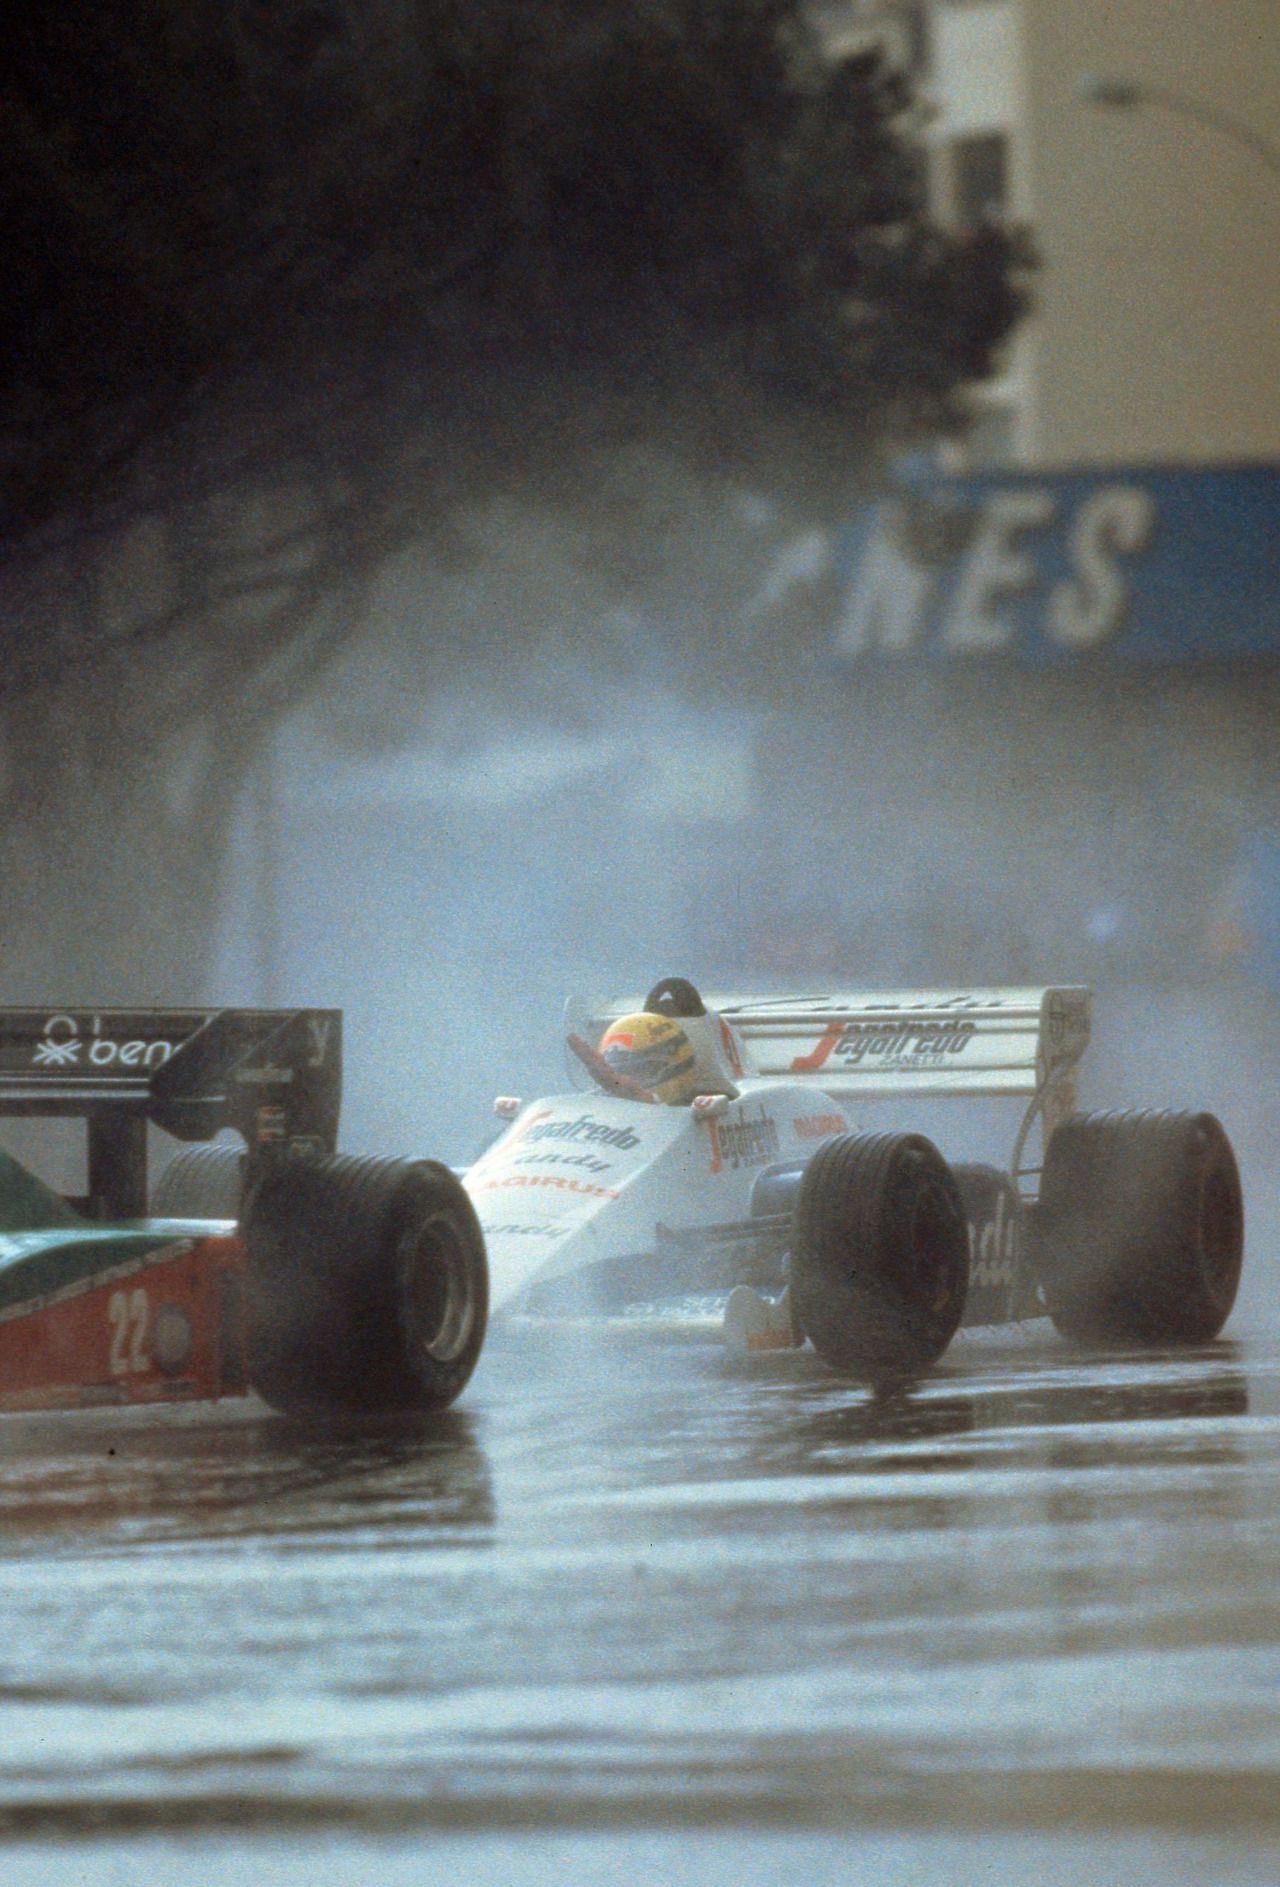 f1pictures: Ayrton Senna Toleman - Hart Monaco 1984